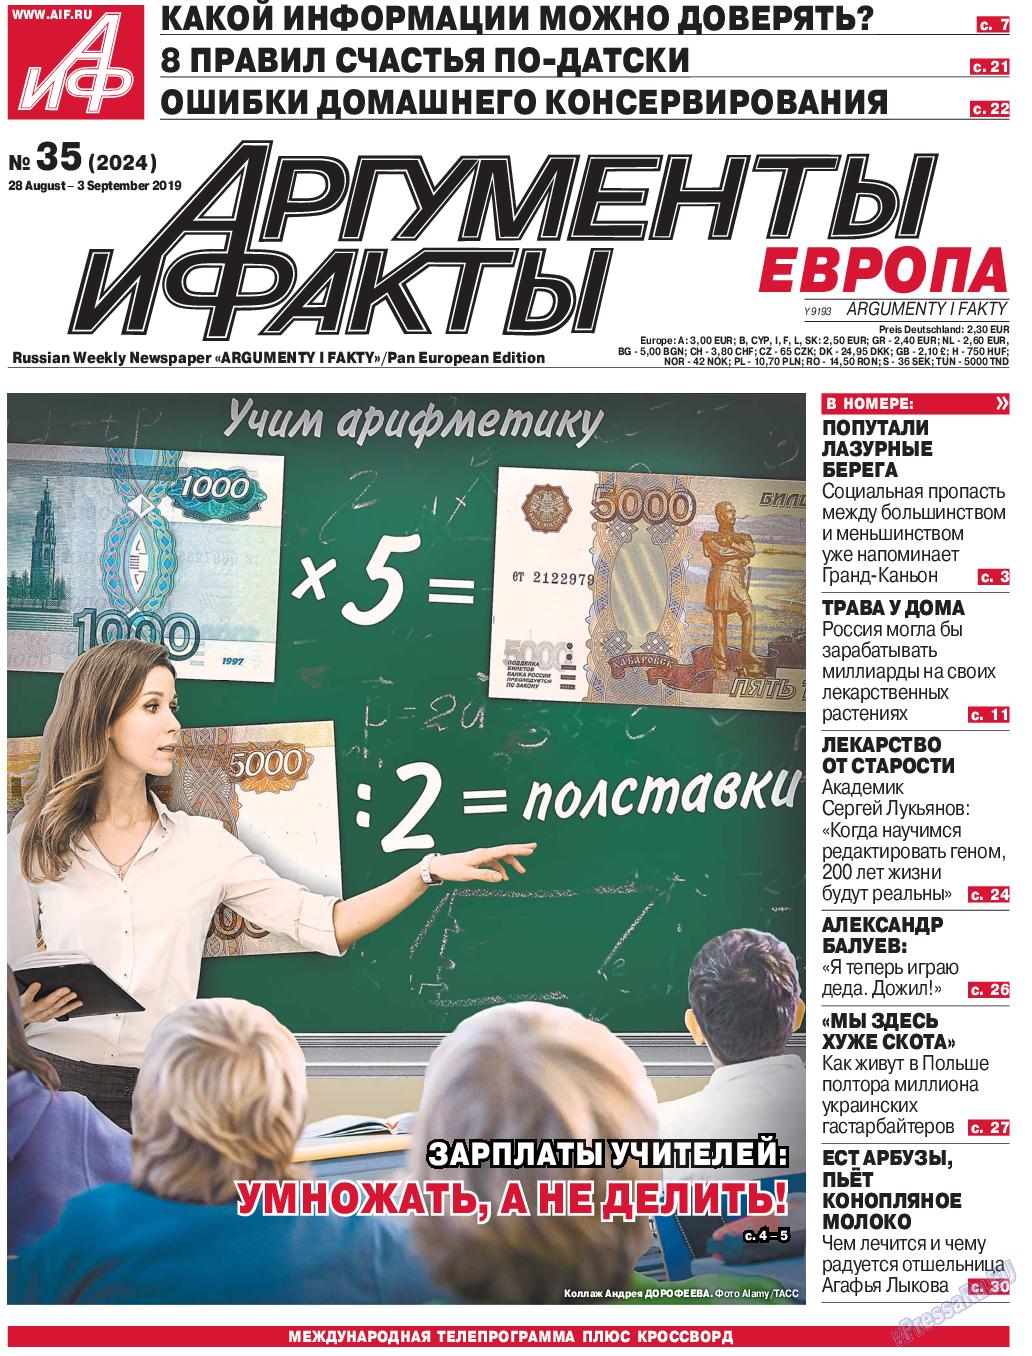 Аргументы и факты Европа (газета). 2019 год, номер 35, стр. 1